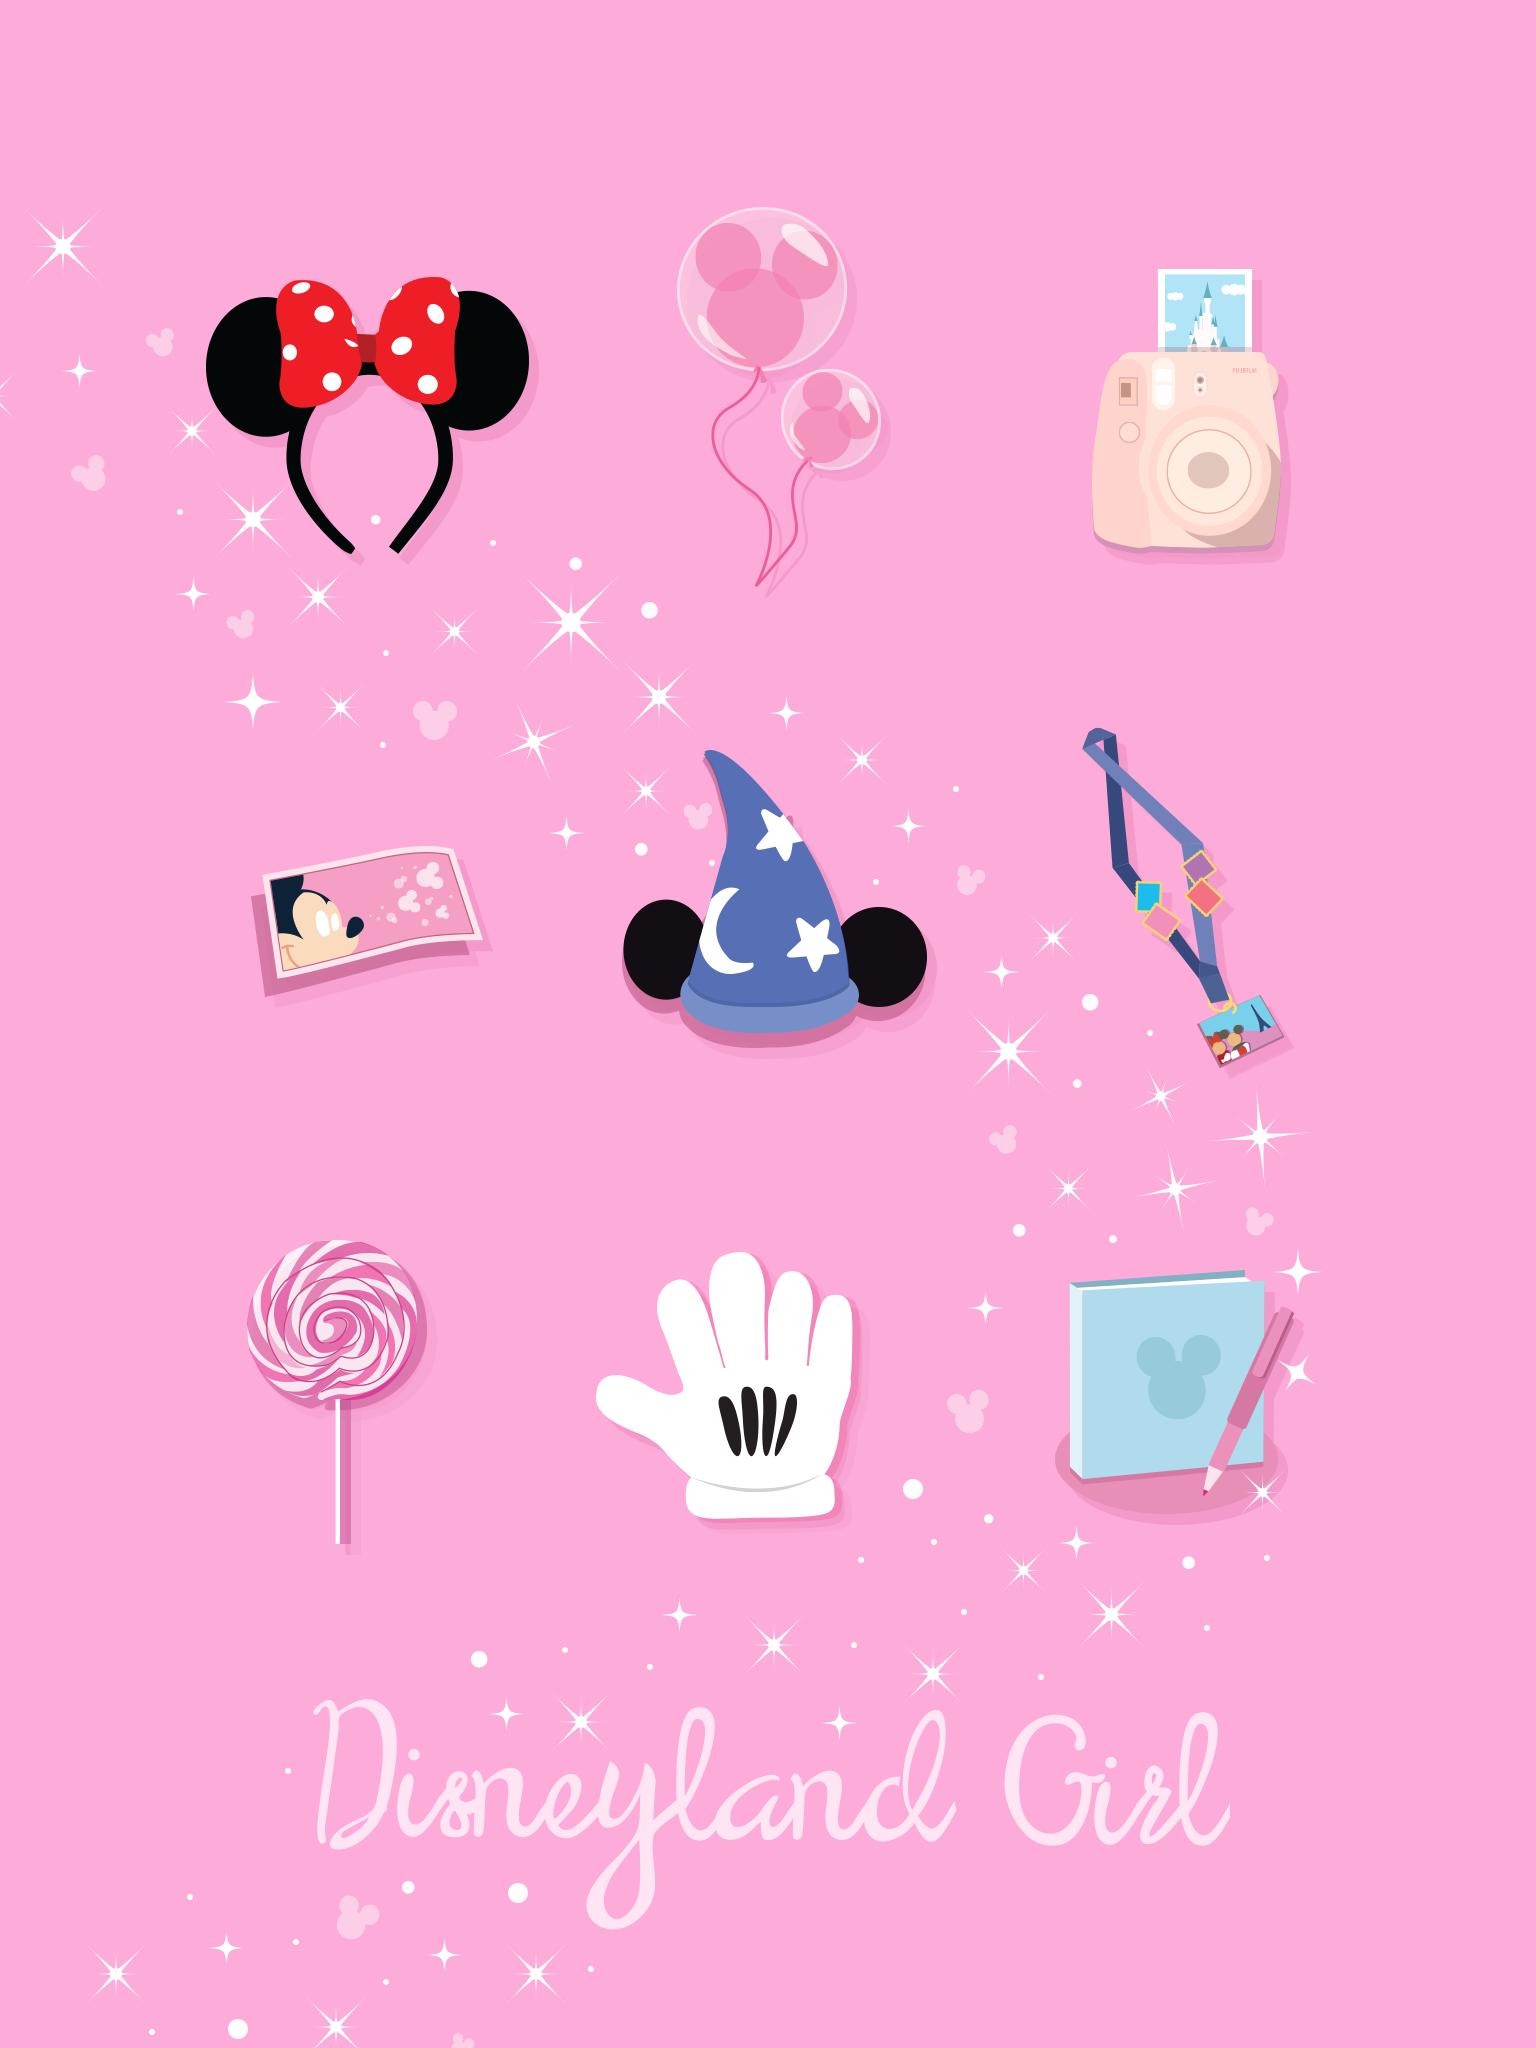 Disney Girl Disneyland Smartphone Ipad Wallpaper Disneyland Iphone Wallpaper Wallpaper Iphone Disney Disney Phone Wallpaper